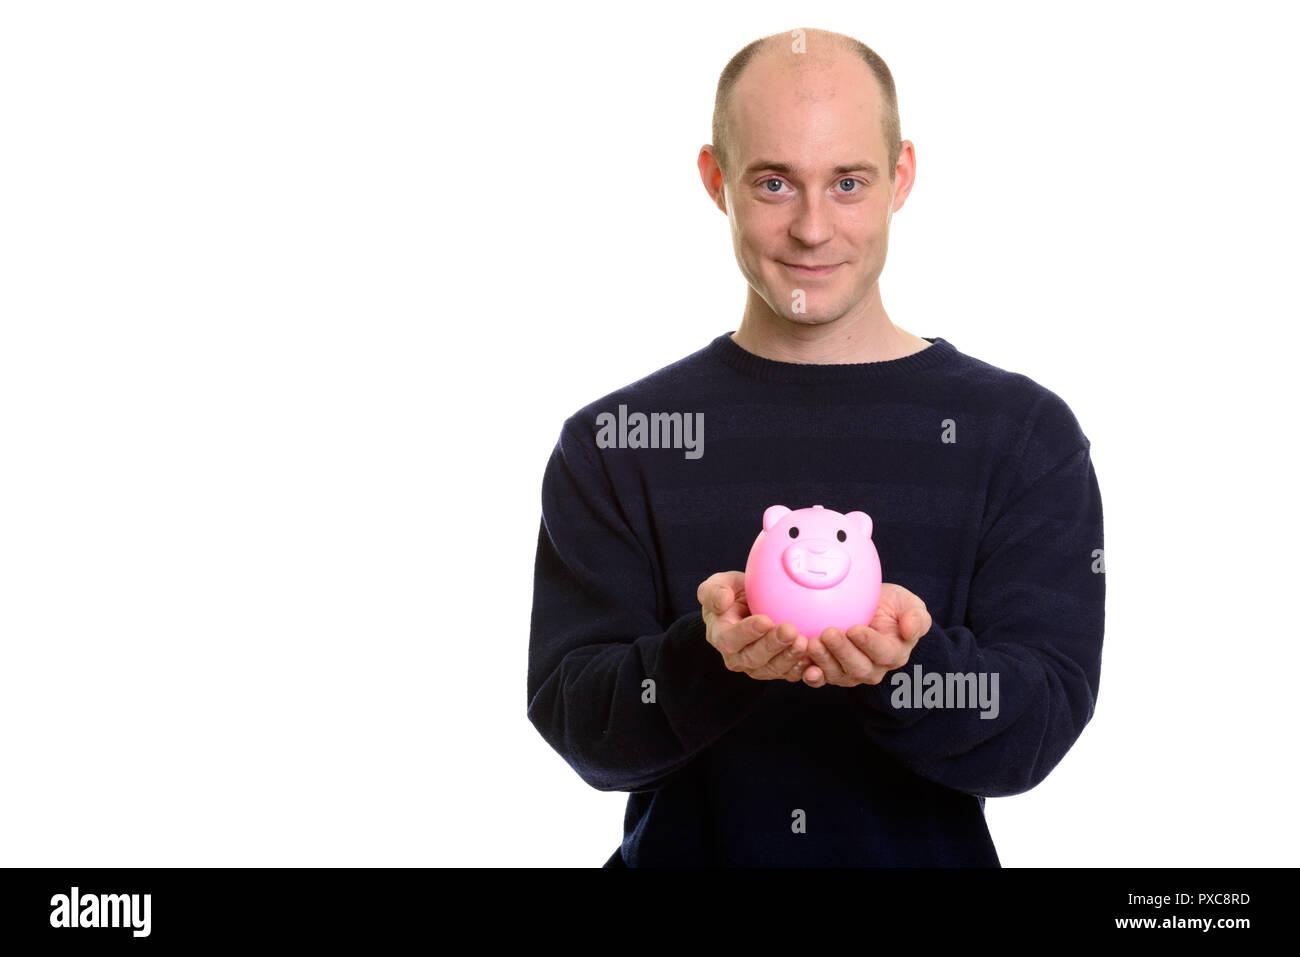 Bald Caucasian man holding piggy bank and looking at camera - Stock Image